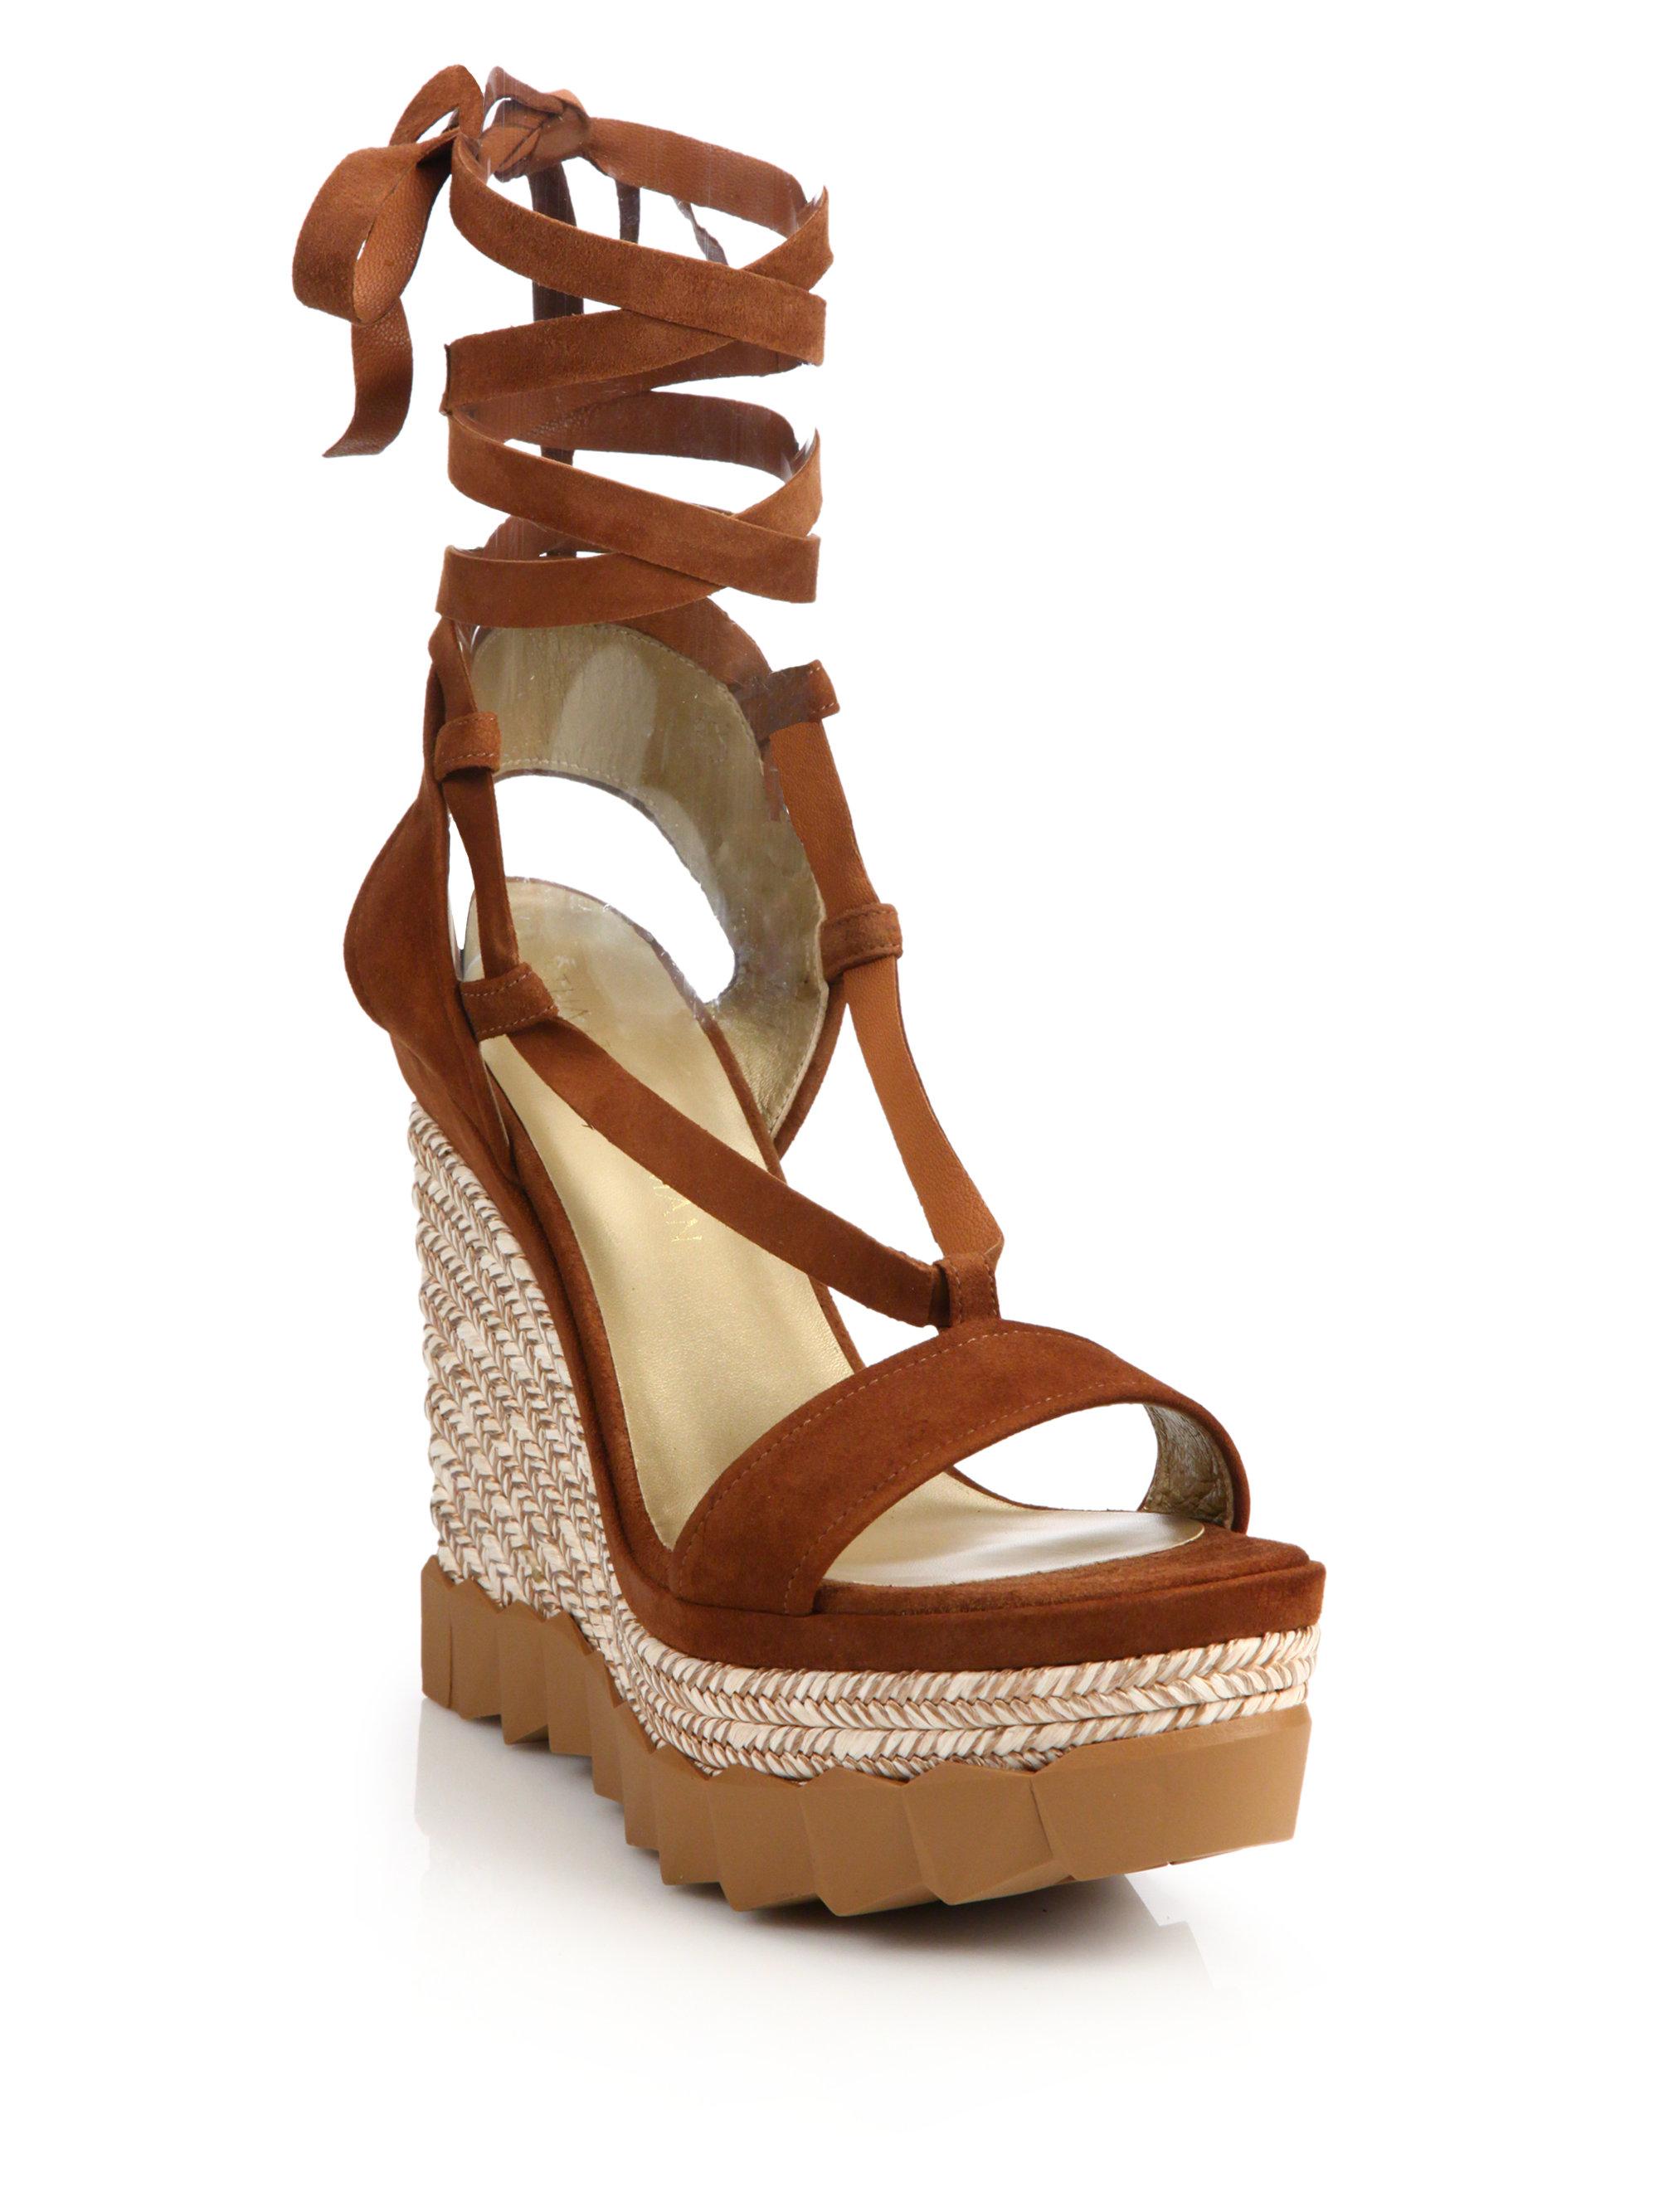 dfe63fa185d Lyst - Stuart Weitzman Cruisin Suede Espadrille Wedge Sandals in Brown